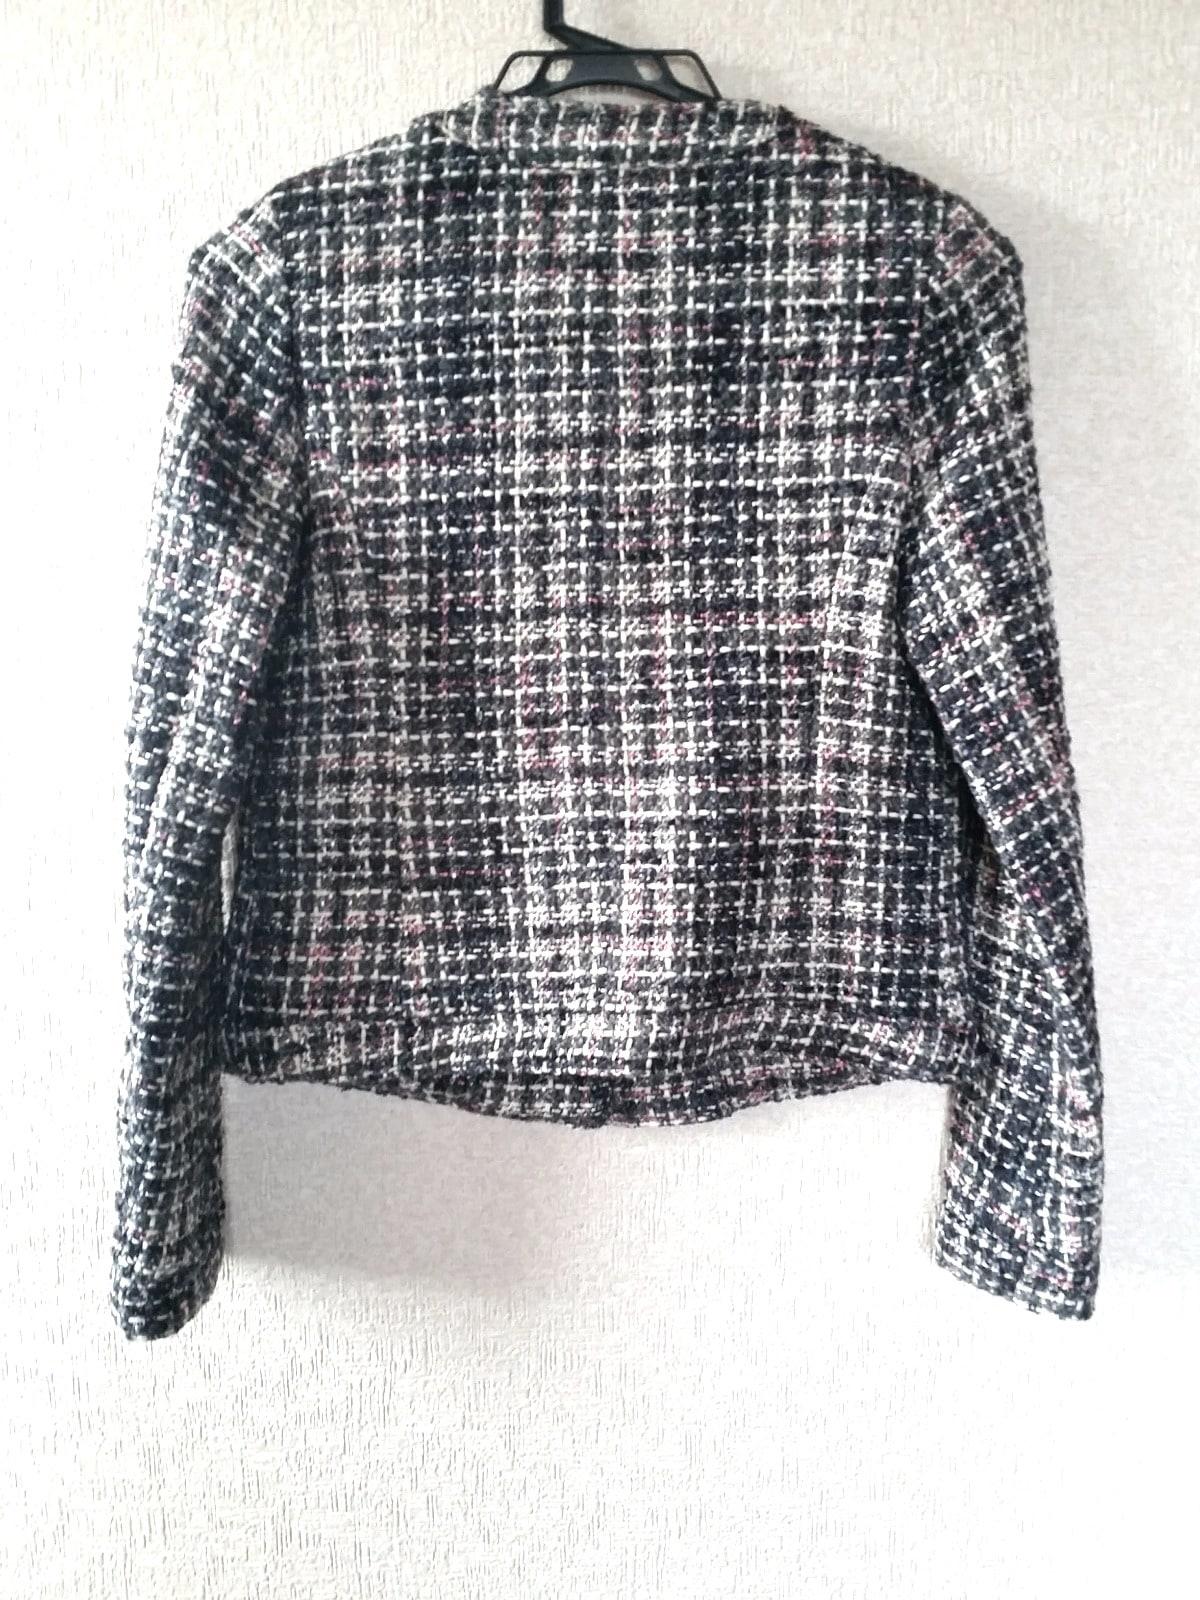 LITHIUM FEMME(リチウムファム)のジャケット